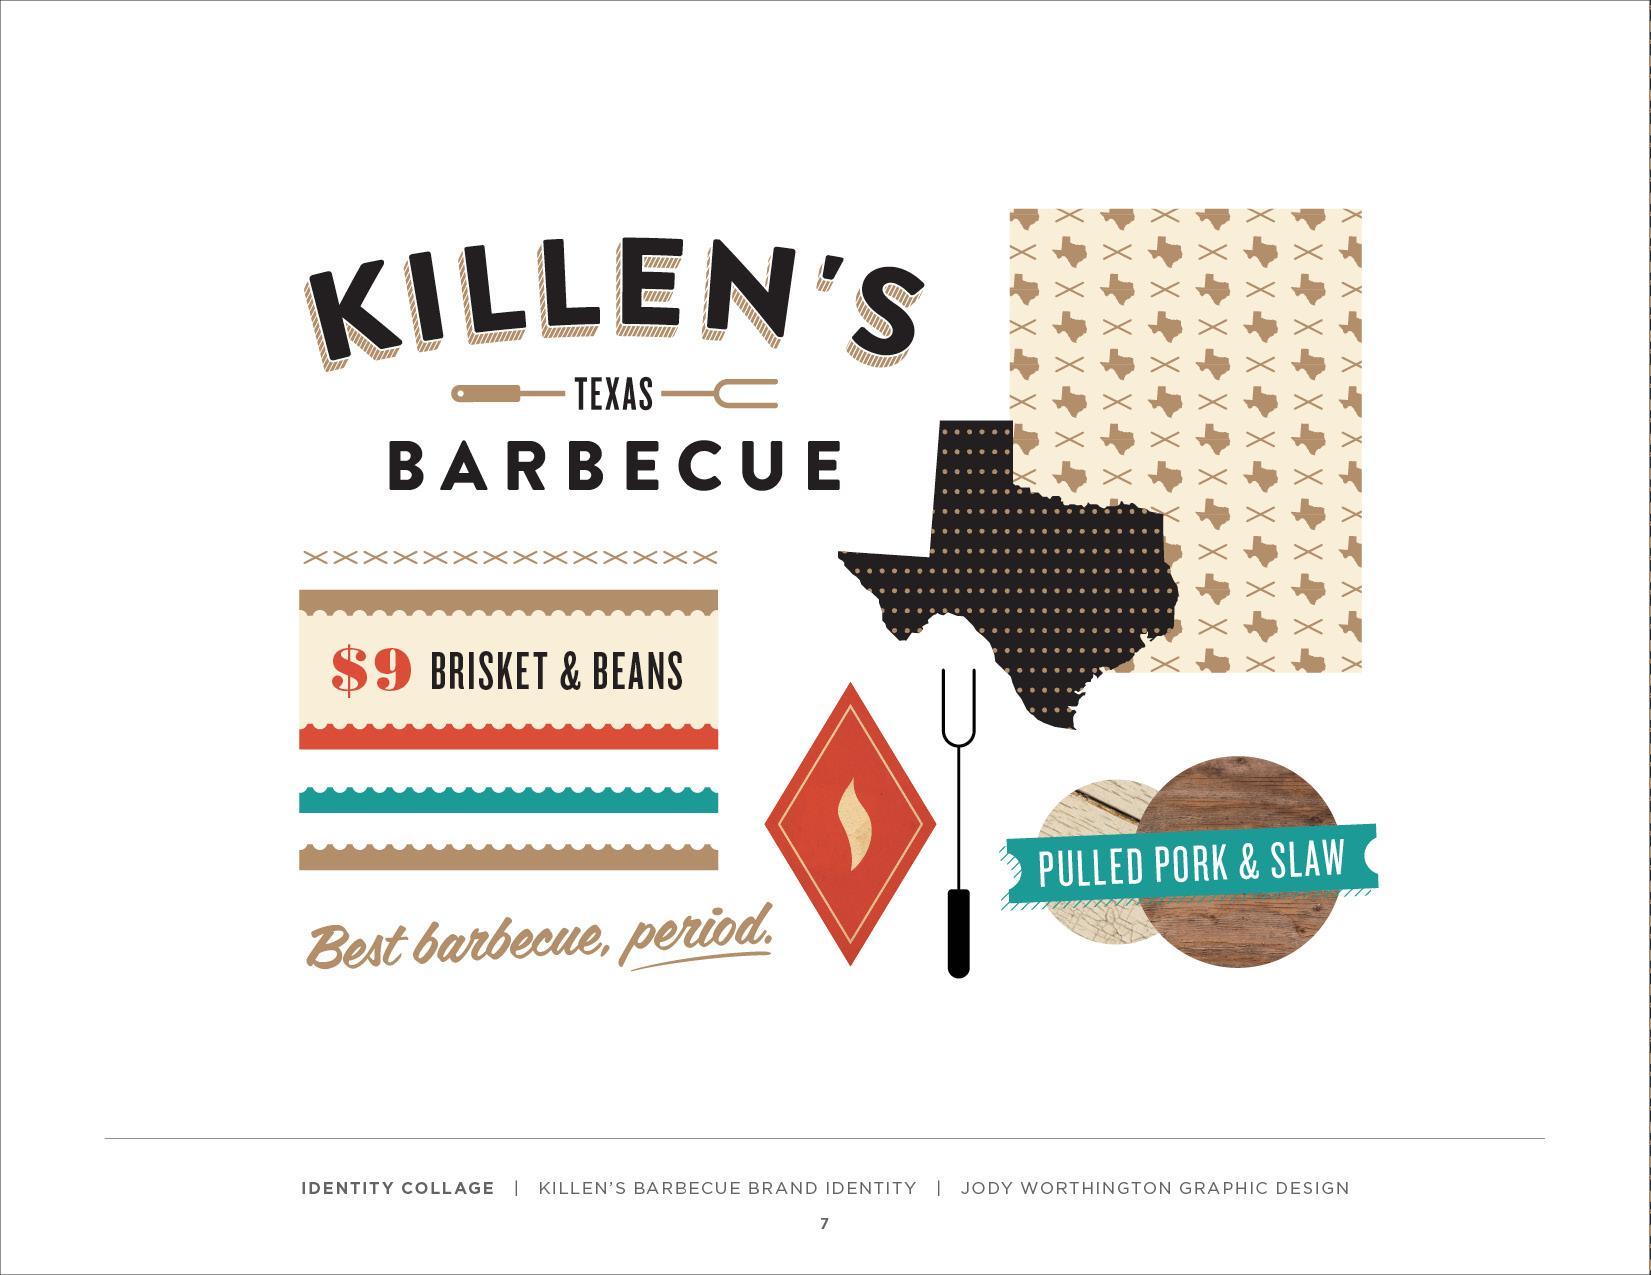 Killen's Barbecue - image 15 - student project